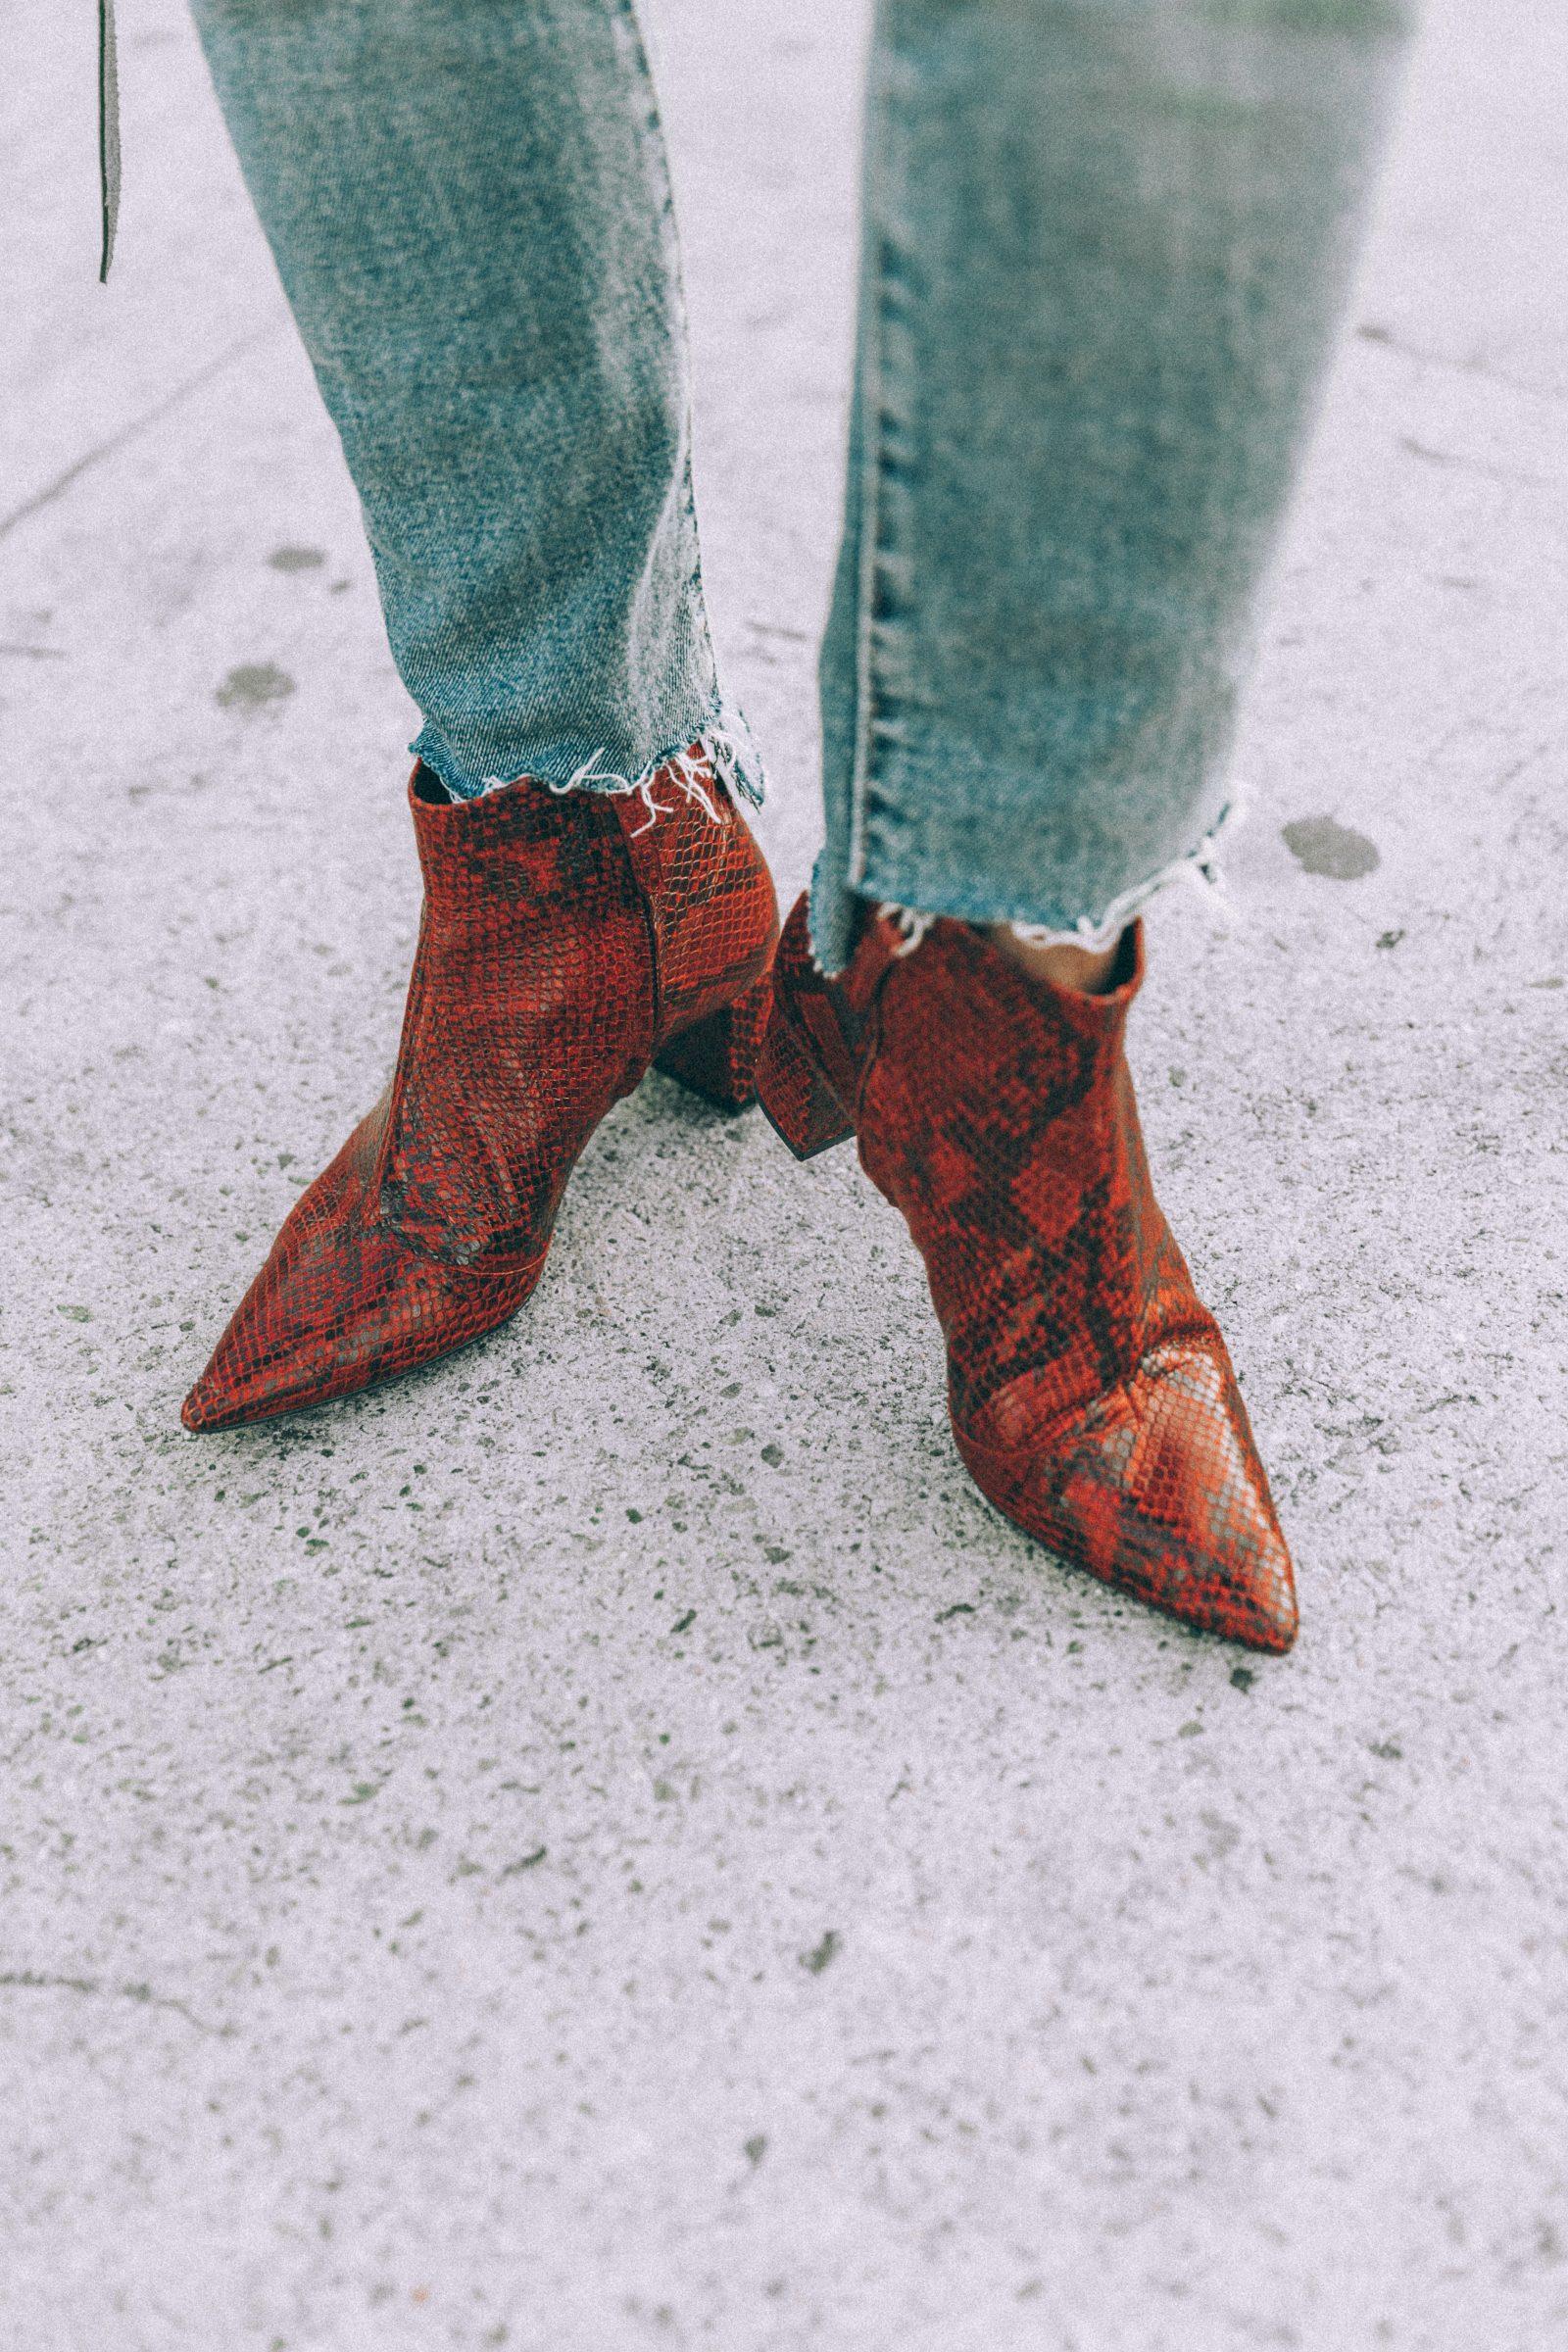 red_bag-snake_boots-gucci-levis-jeans-denim-iro_paris-black_blazer-los_angeles-la-fairfax-outfit-street_style-collage_vintage-62